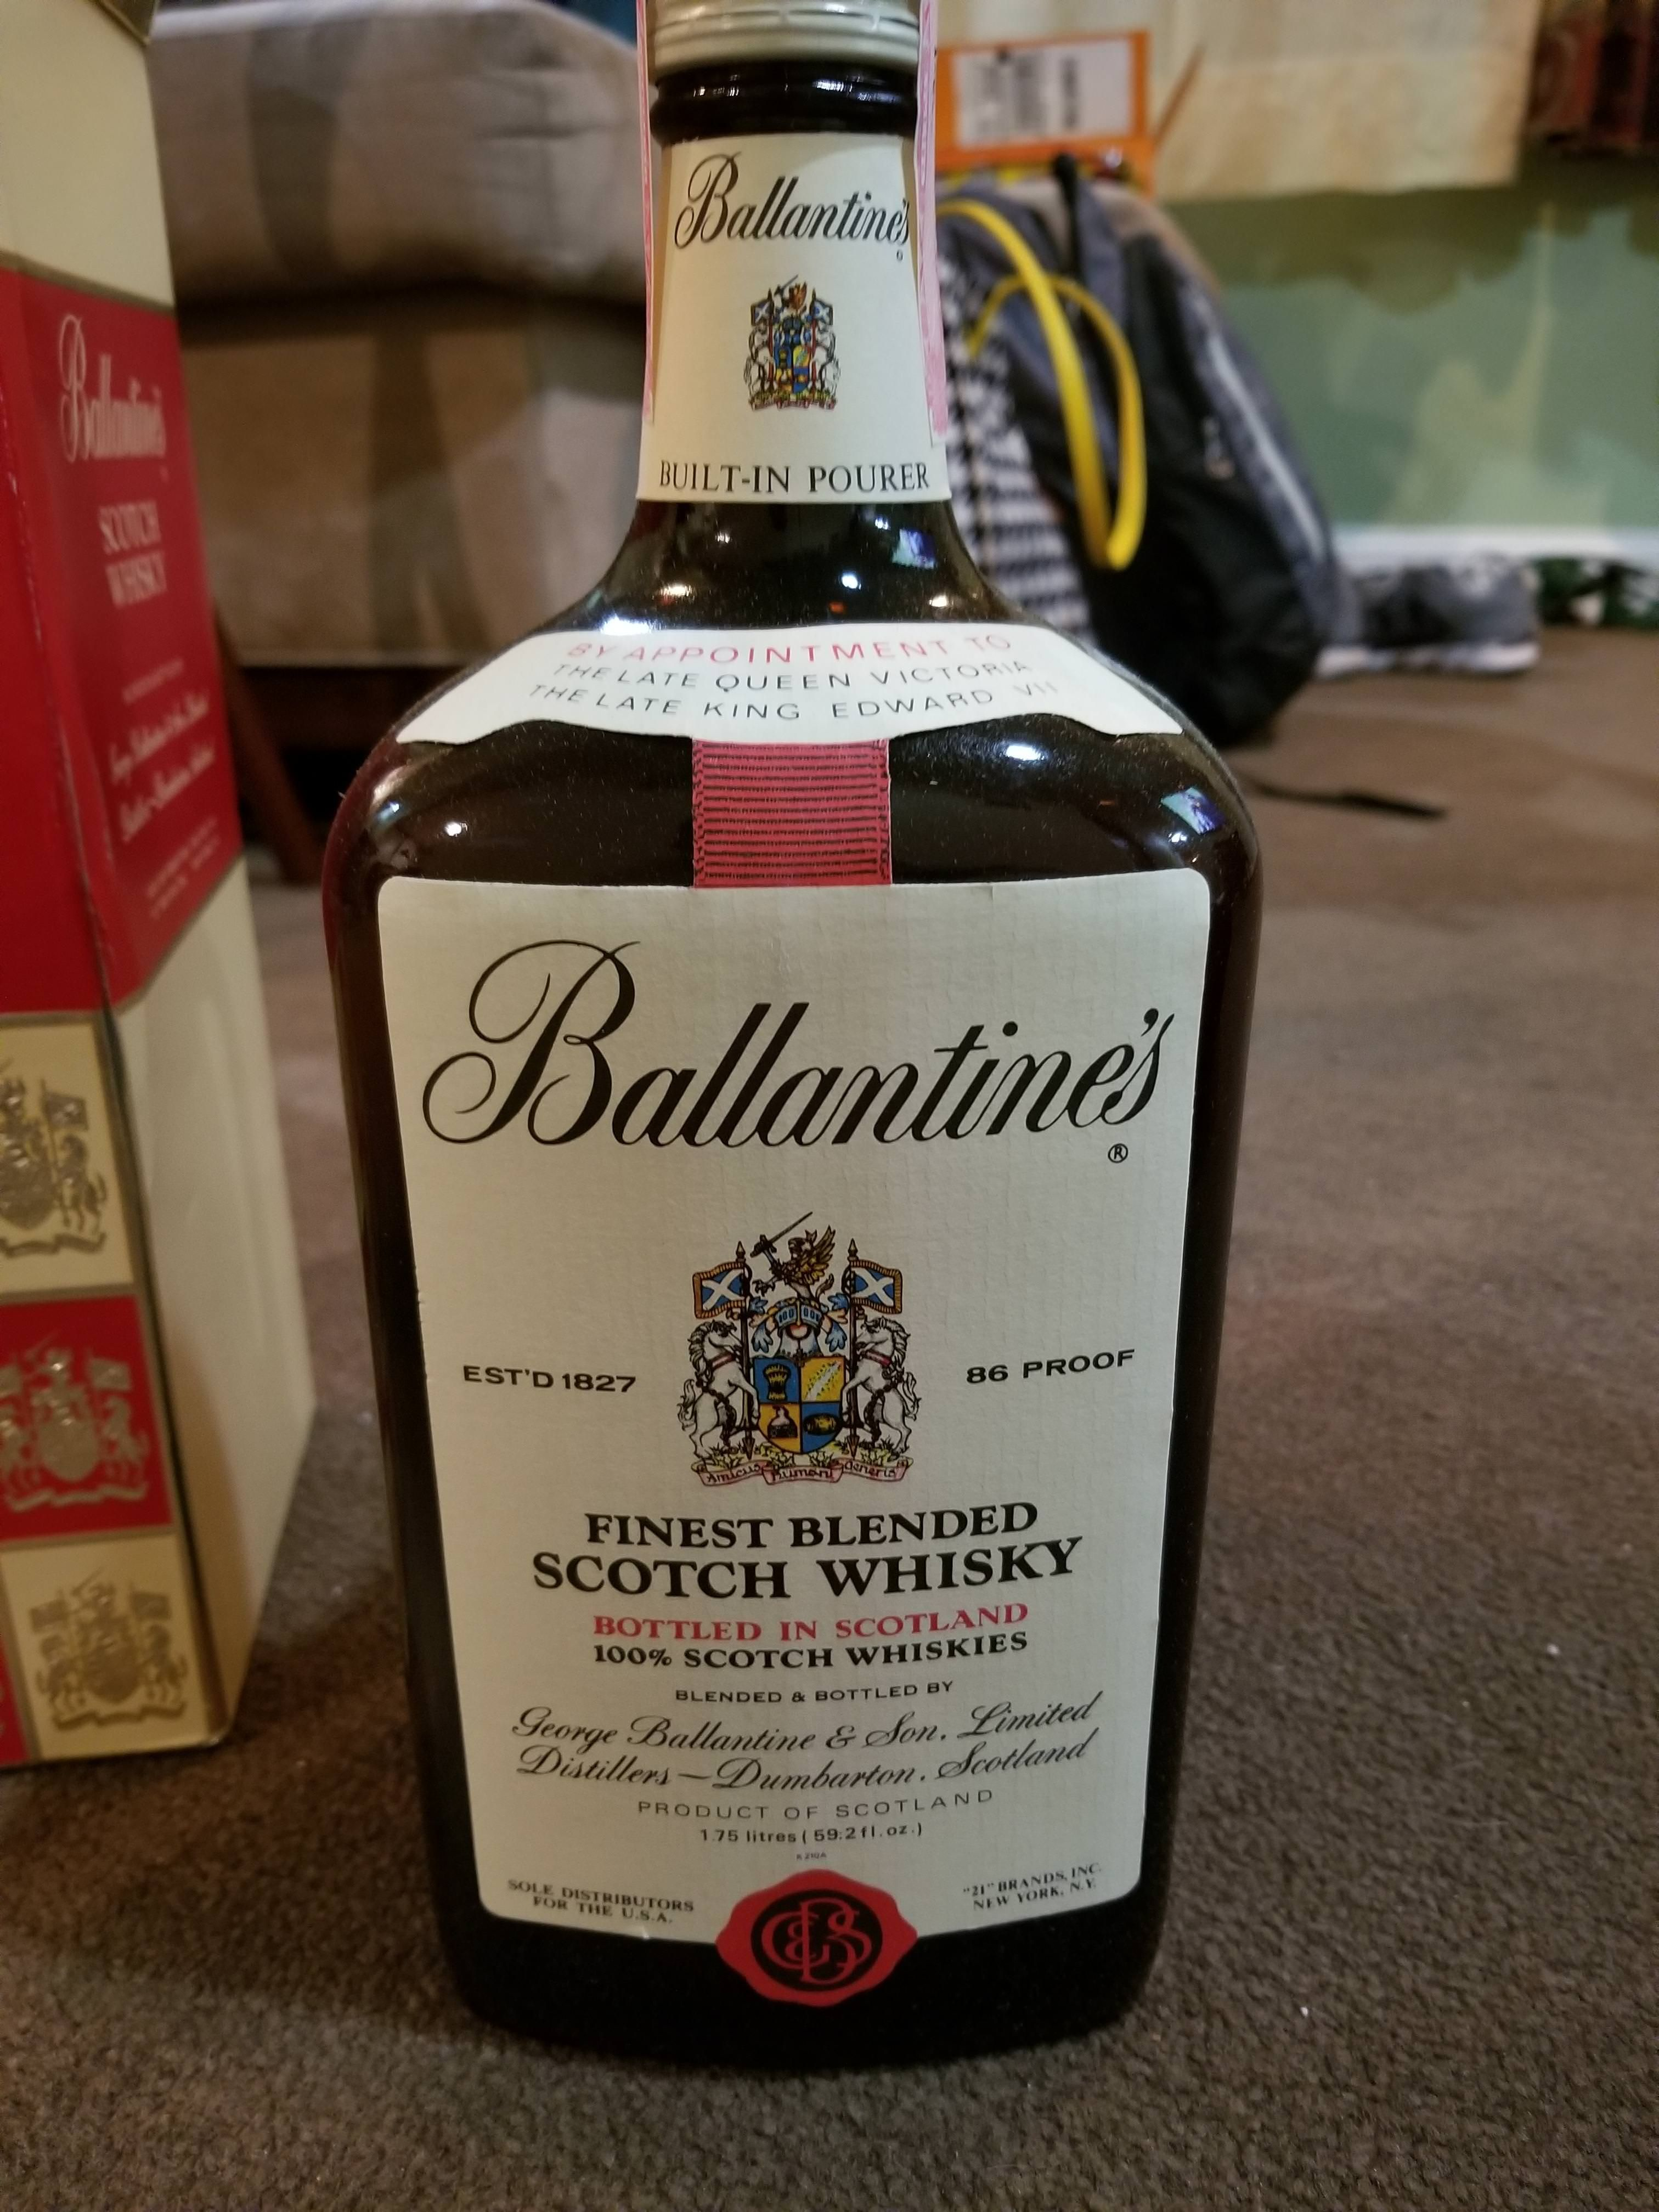 Pin By Todd Jackson On Booze Blended Scotch Whisky Bottle